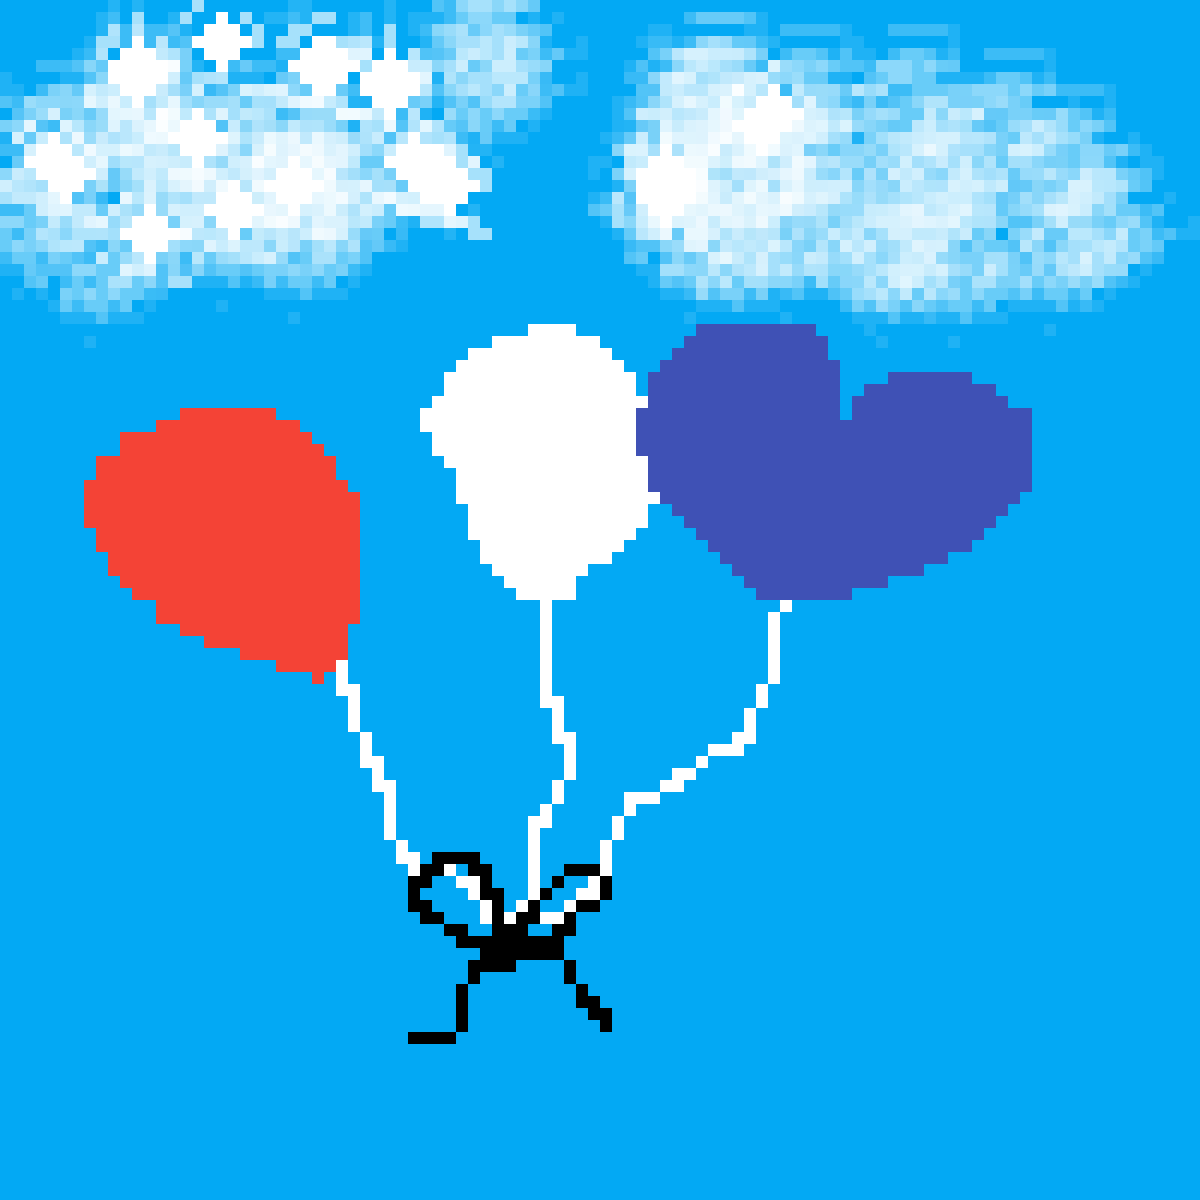 Floating Balloons by HudaTheHooman